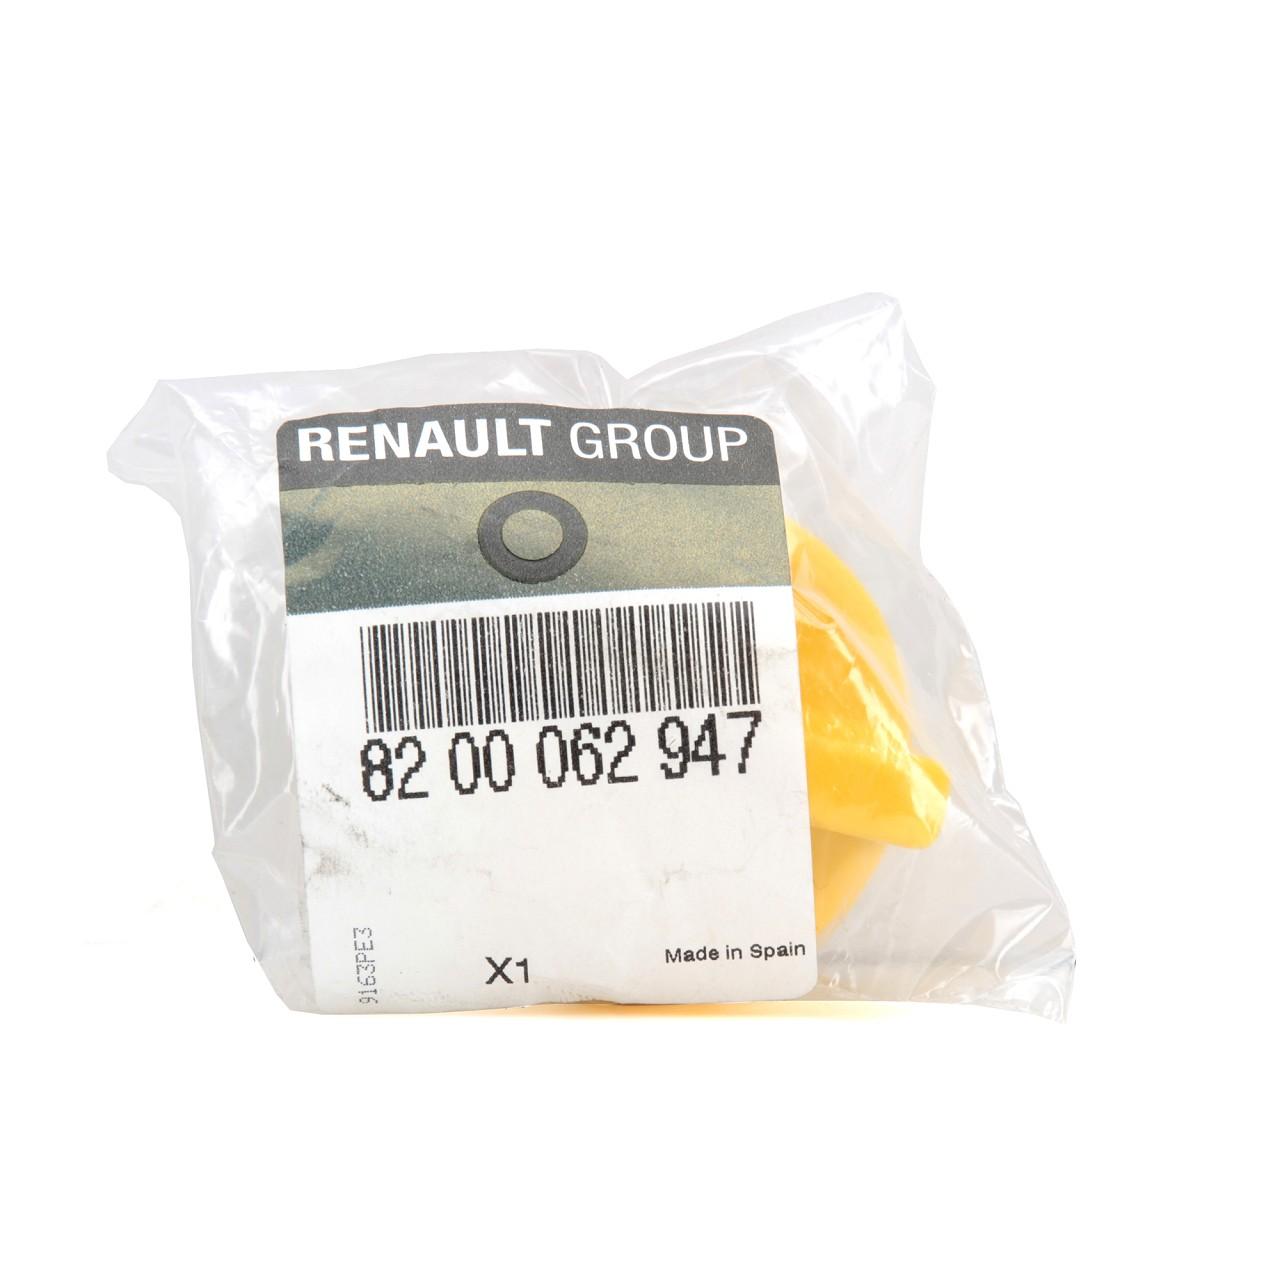 ORIGINAL Renault Ölverschlusskappe Öldeckel Ölkappe Ölverschluss 8200062947